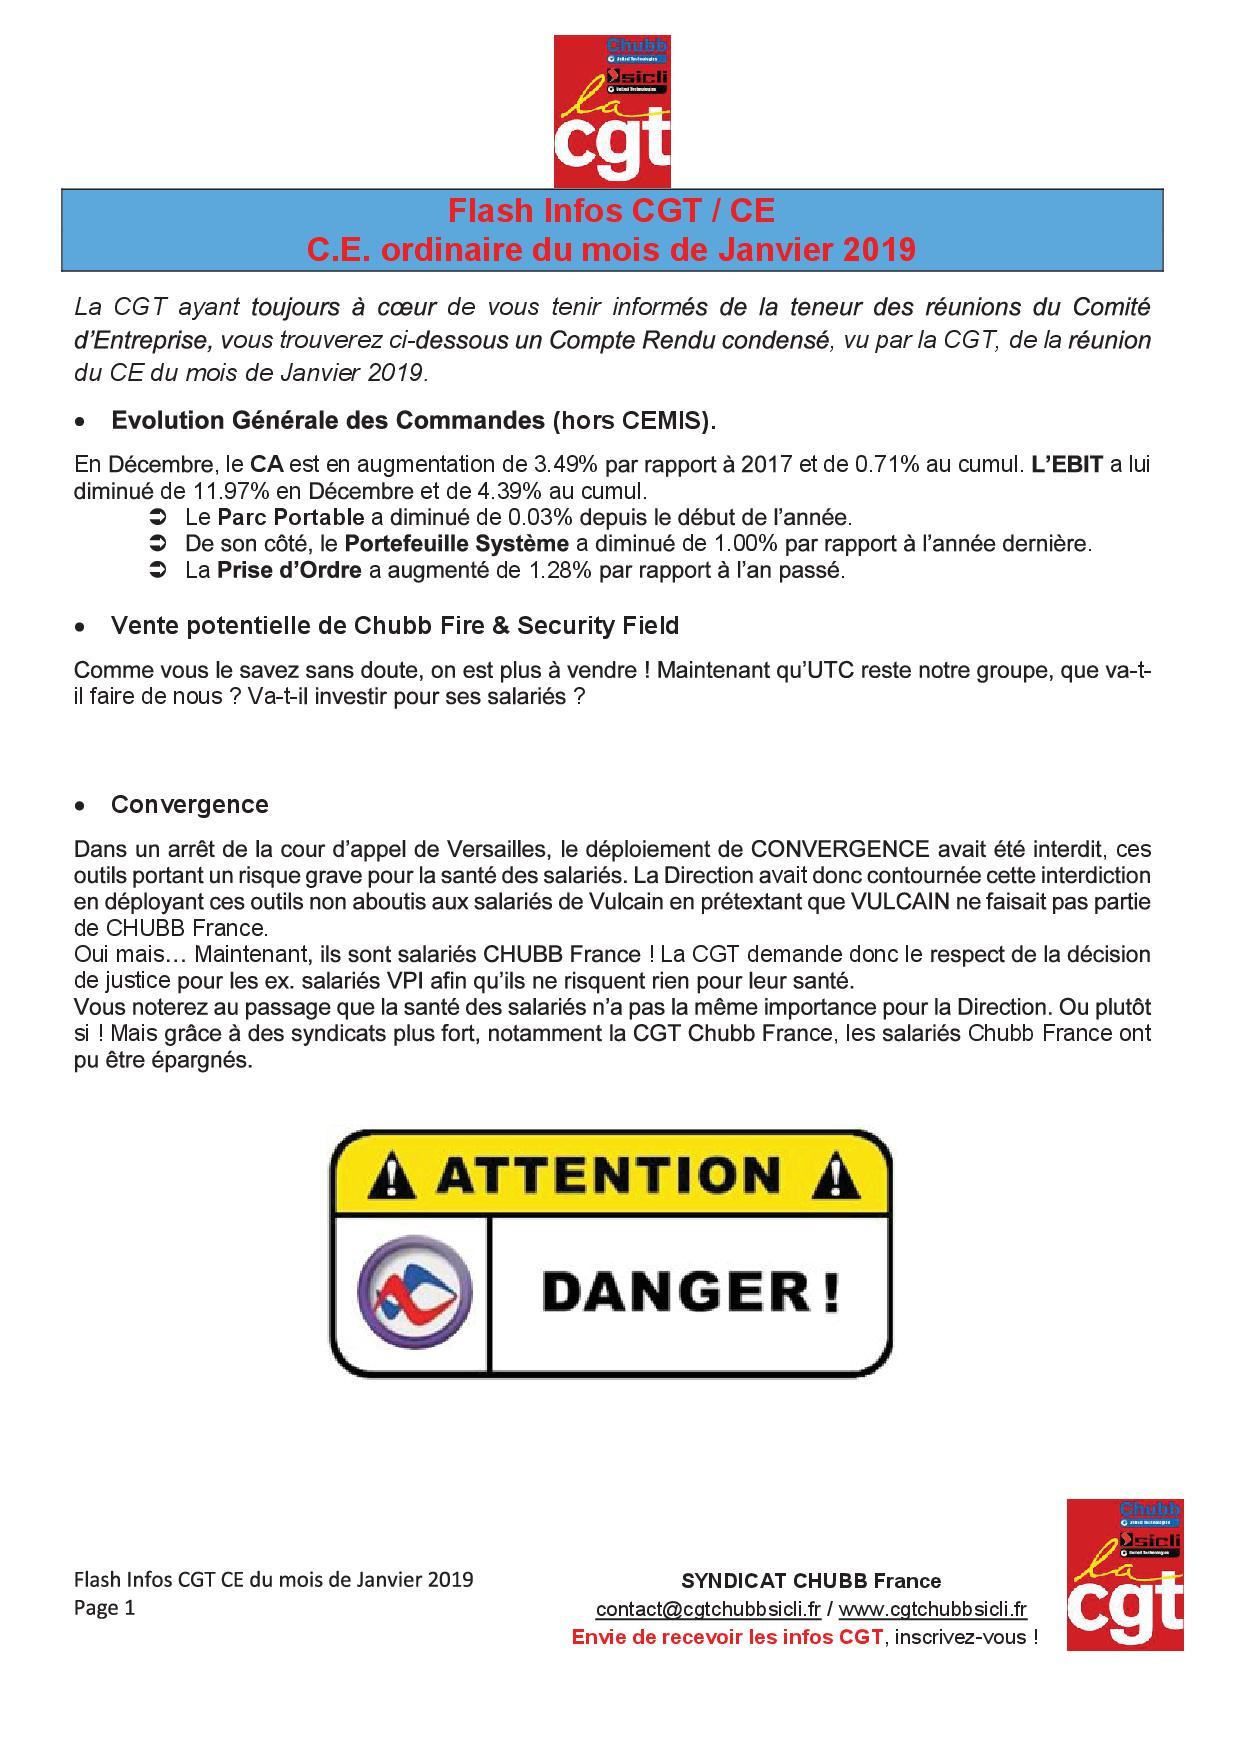 Flash info ce cgt 0120191